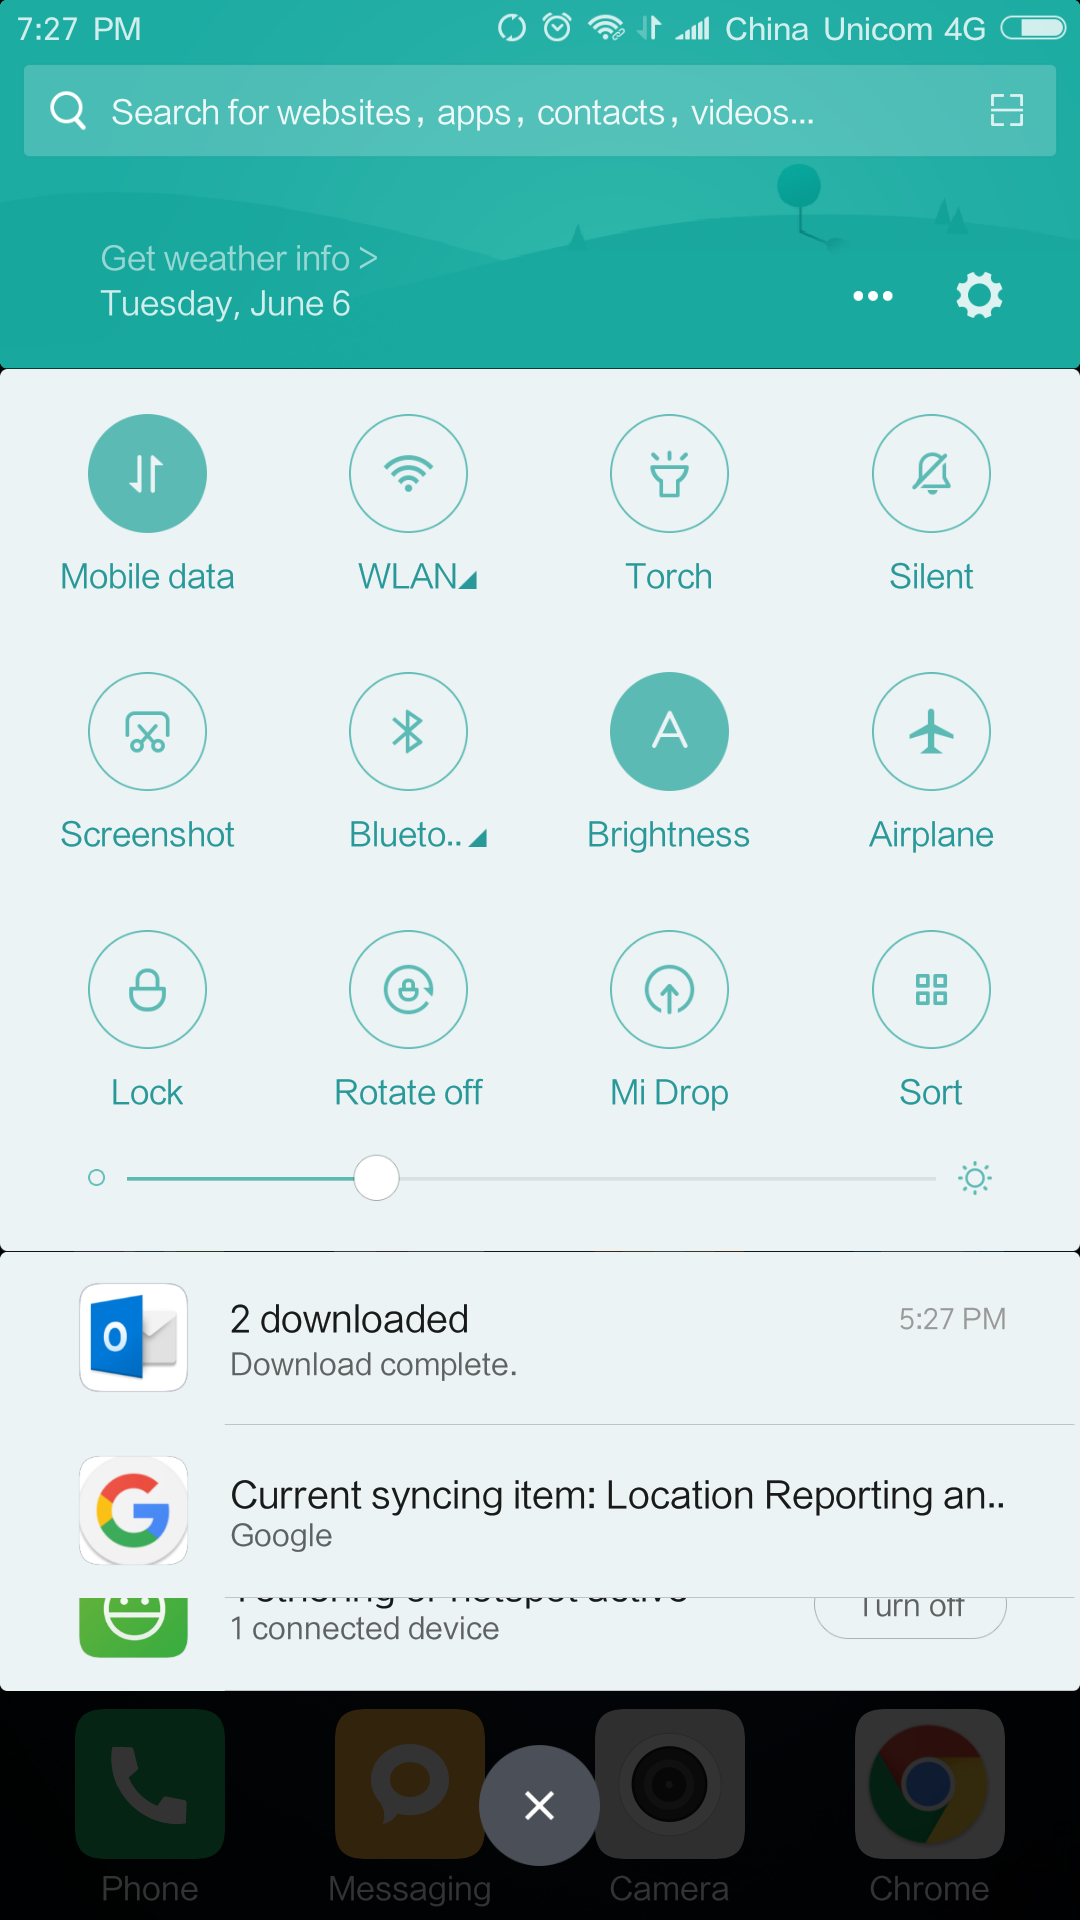 Xiaomi Mi Max 2 Android 7 3